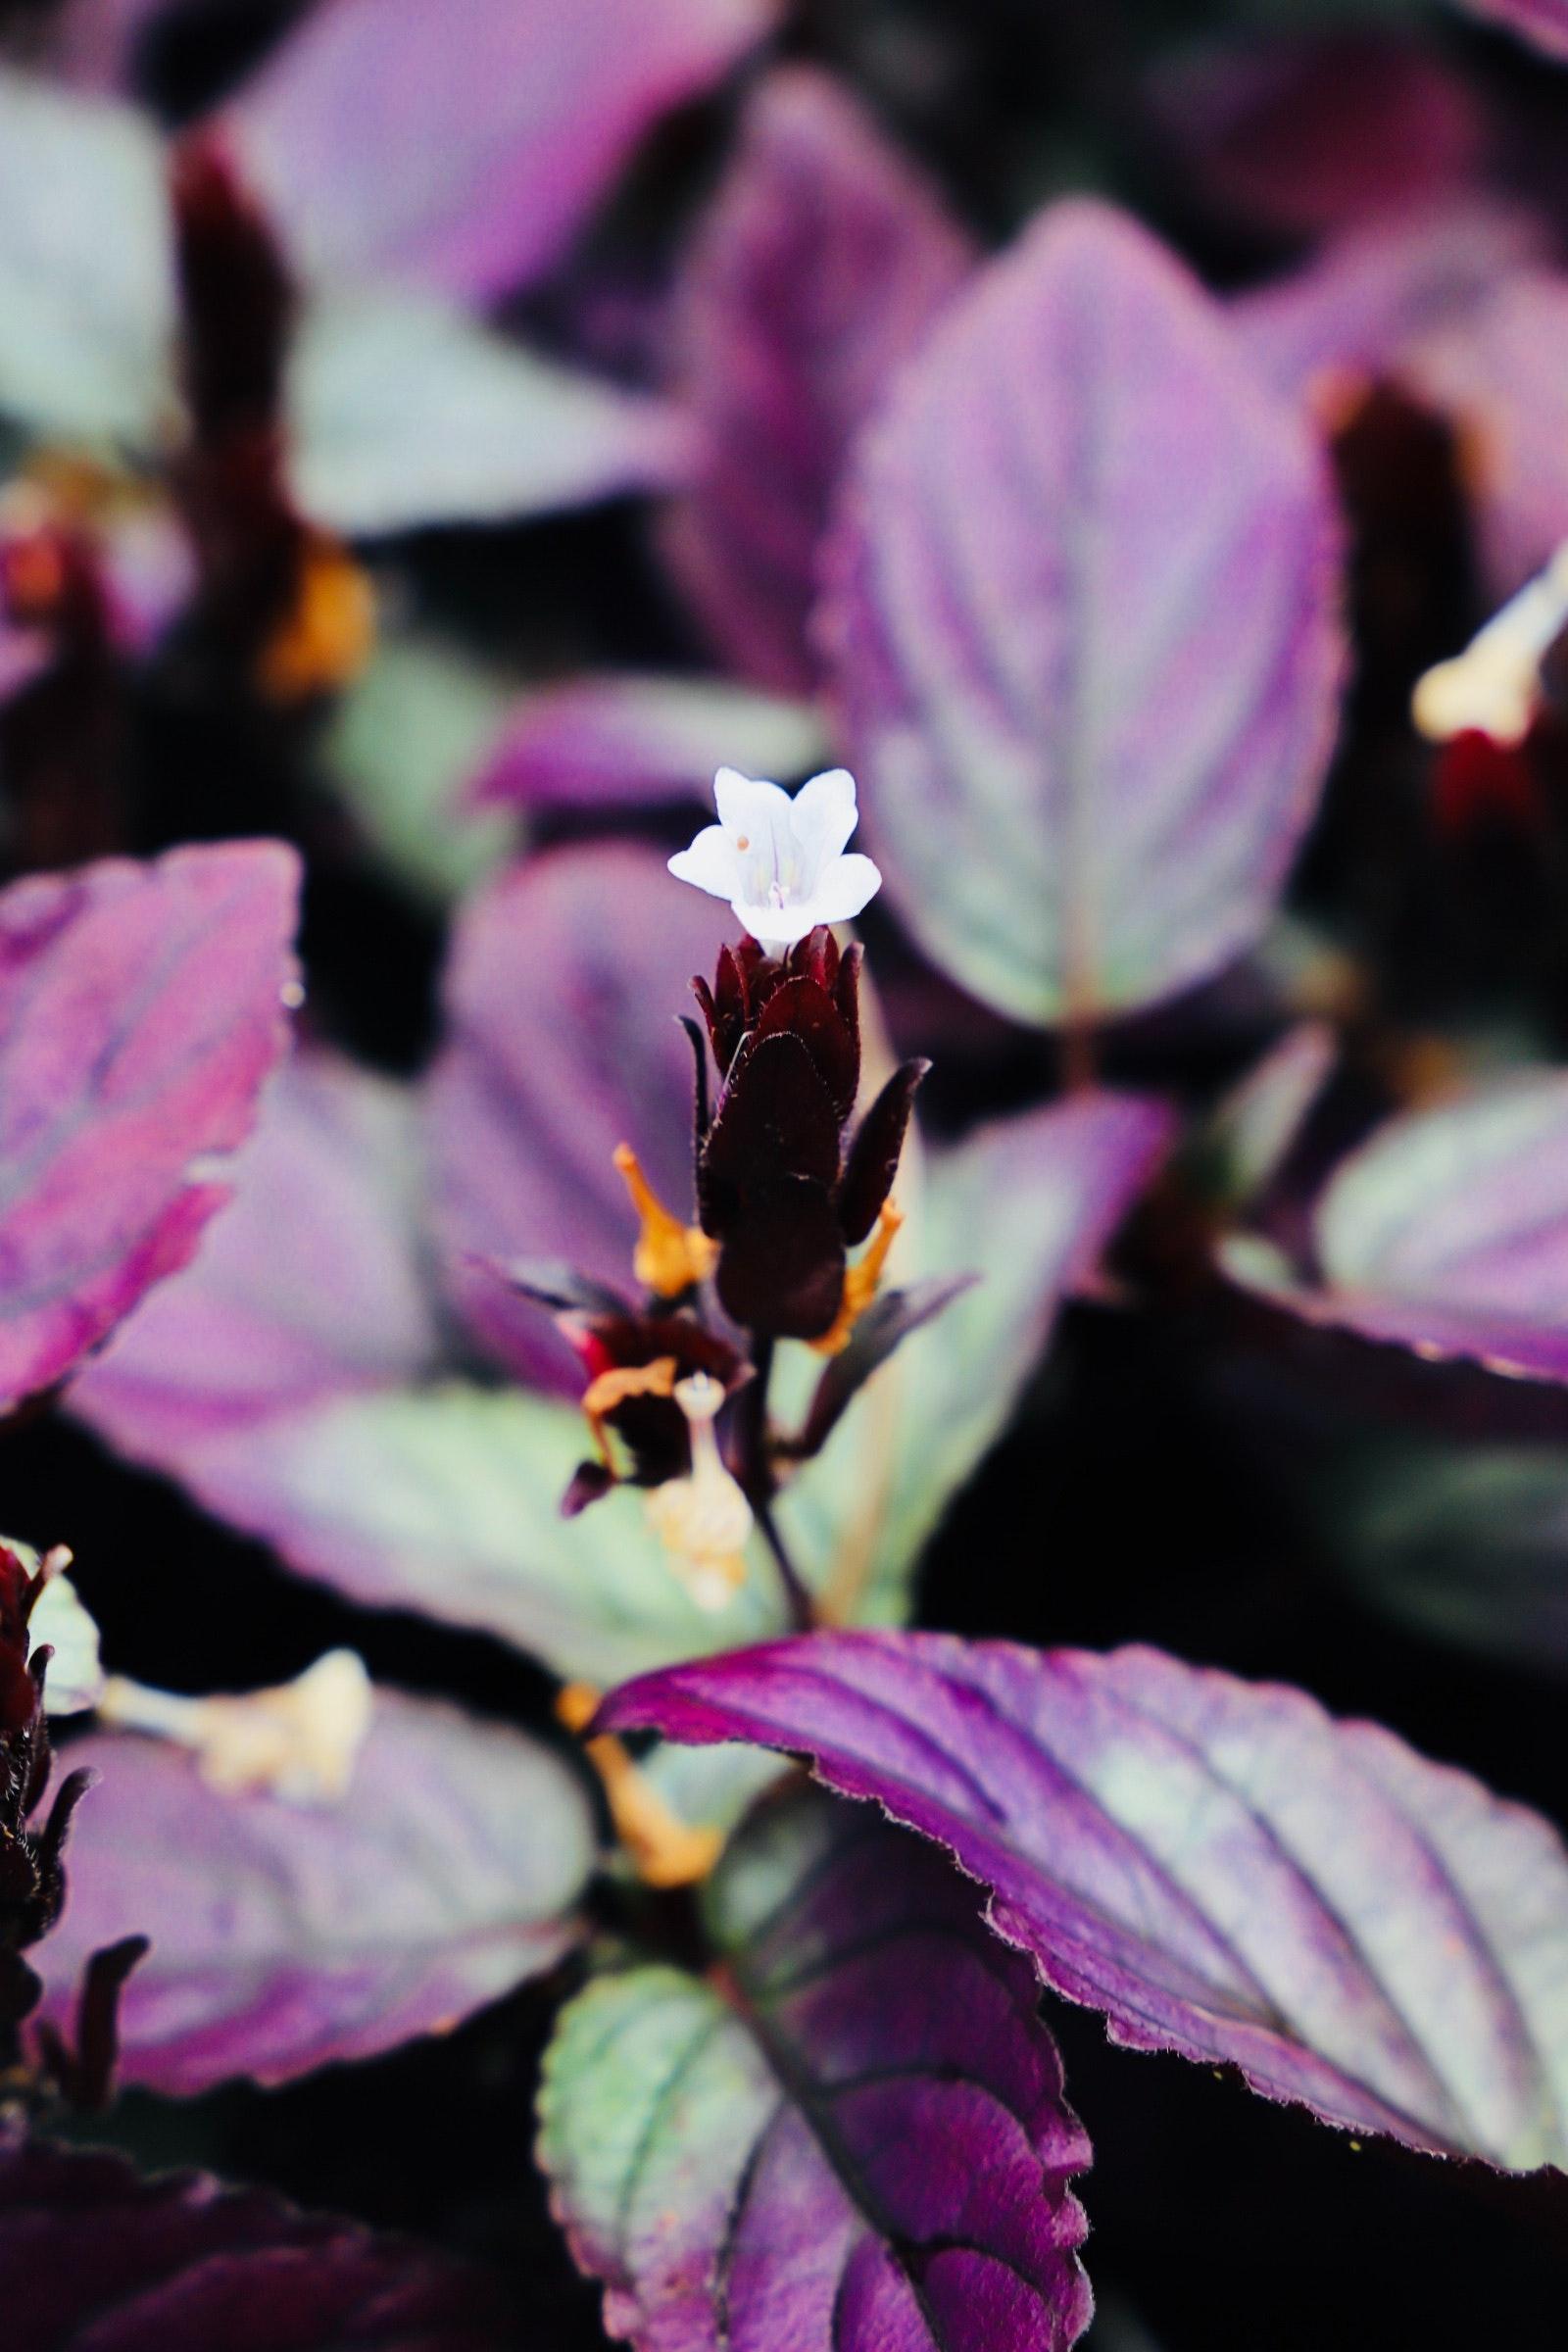 Free stock photo of hawaiian flowers free download izmirmasajfo Images